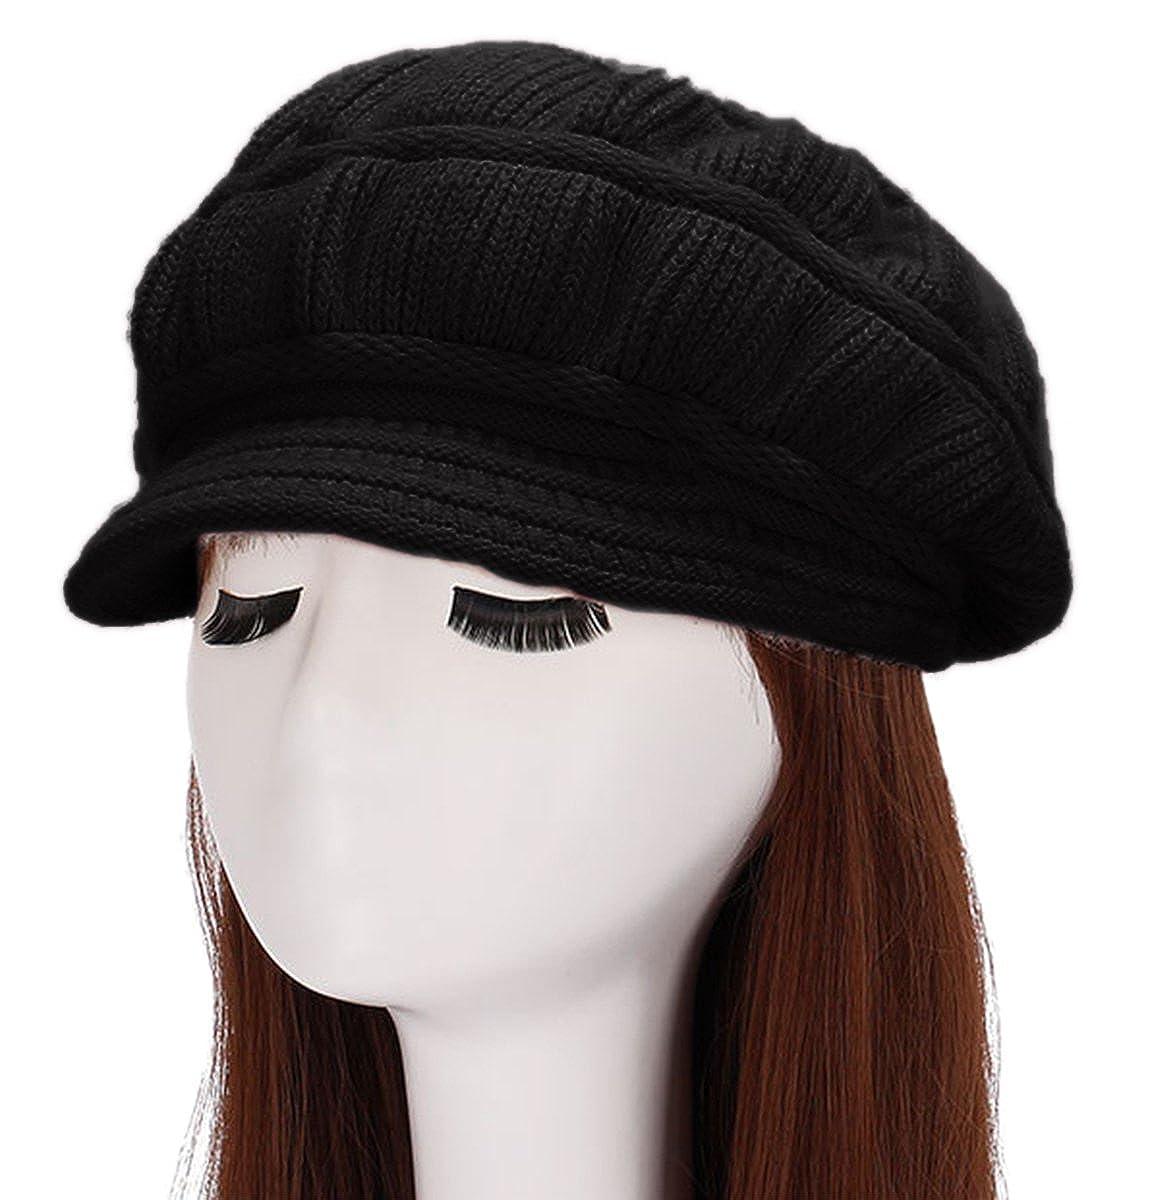 eebfa3f7e8e CLASSICALLY GORGEOUS This soft hat makes a great gift this season